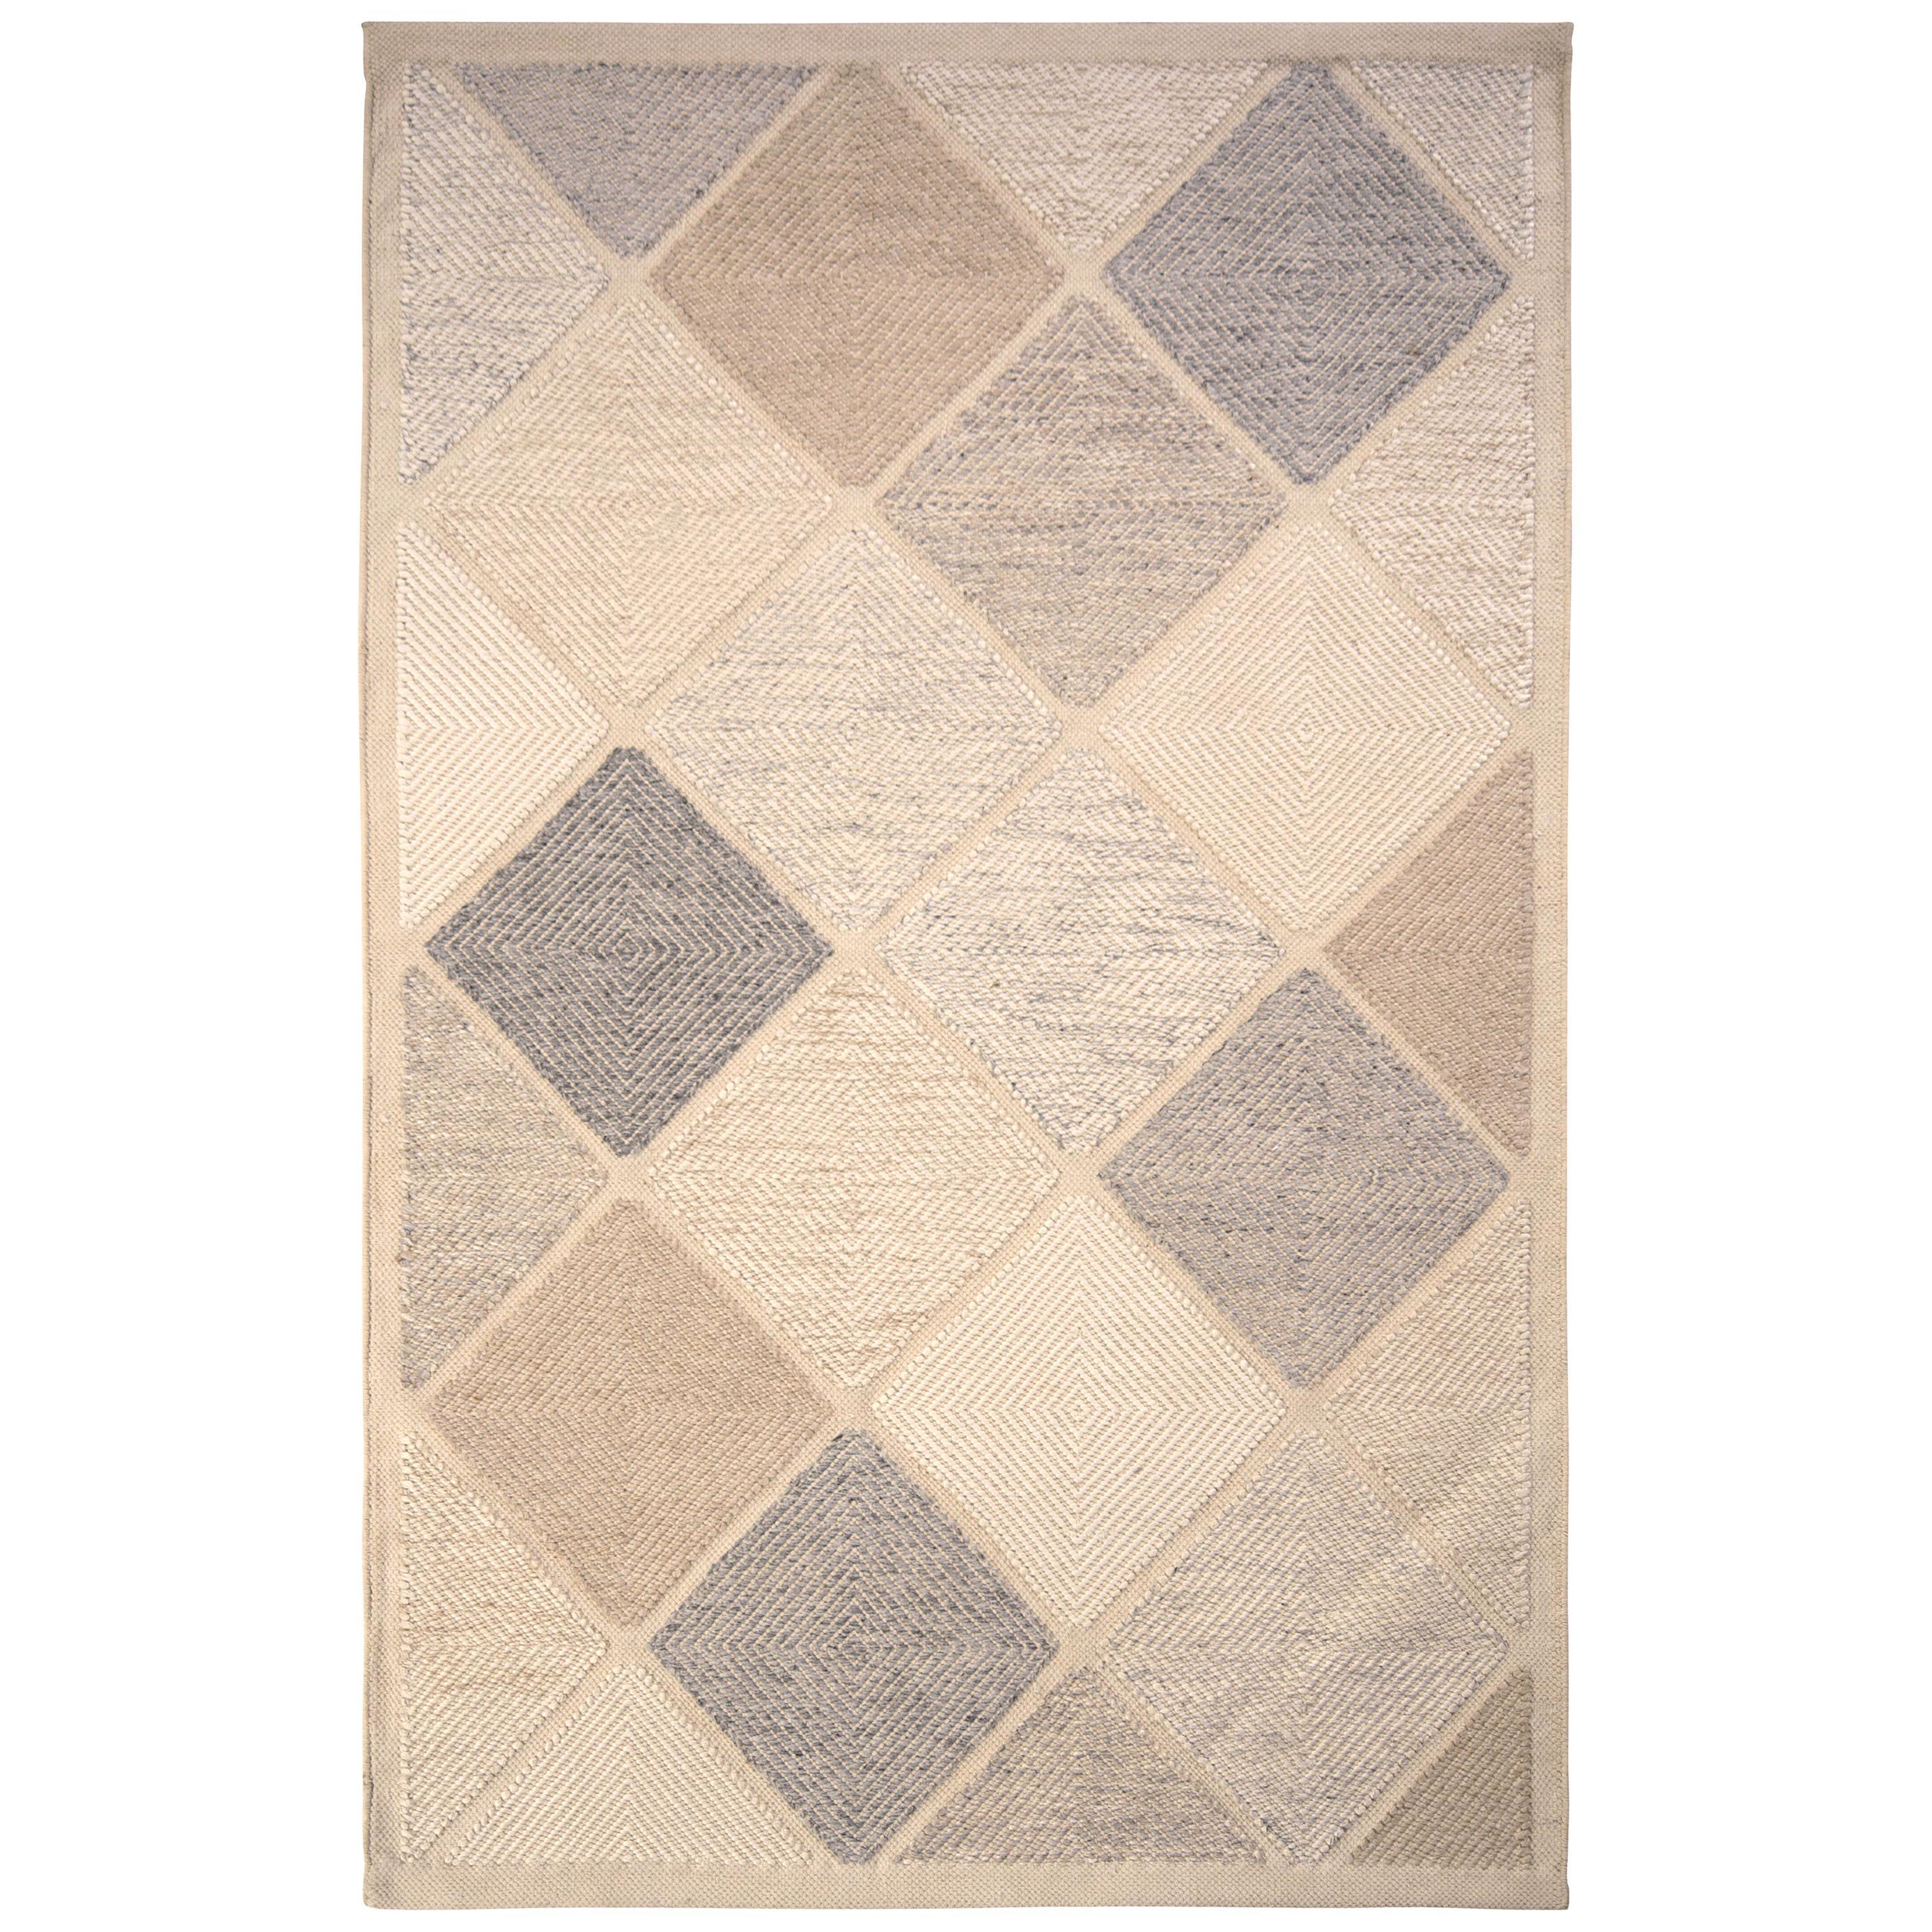 Rug & Kilim's Scandinavian Style Flat-Weave Gray Blue Geometric Pattern